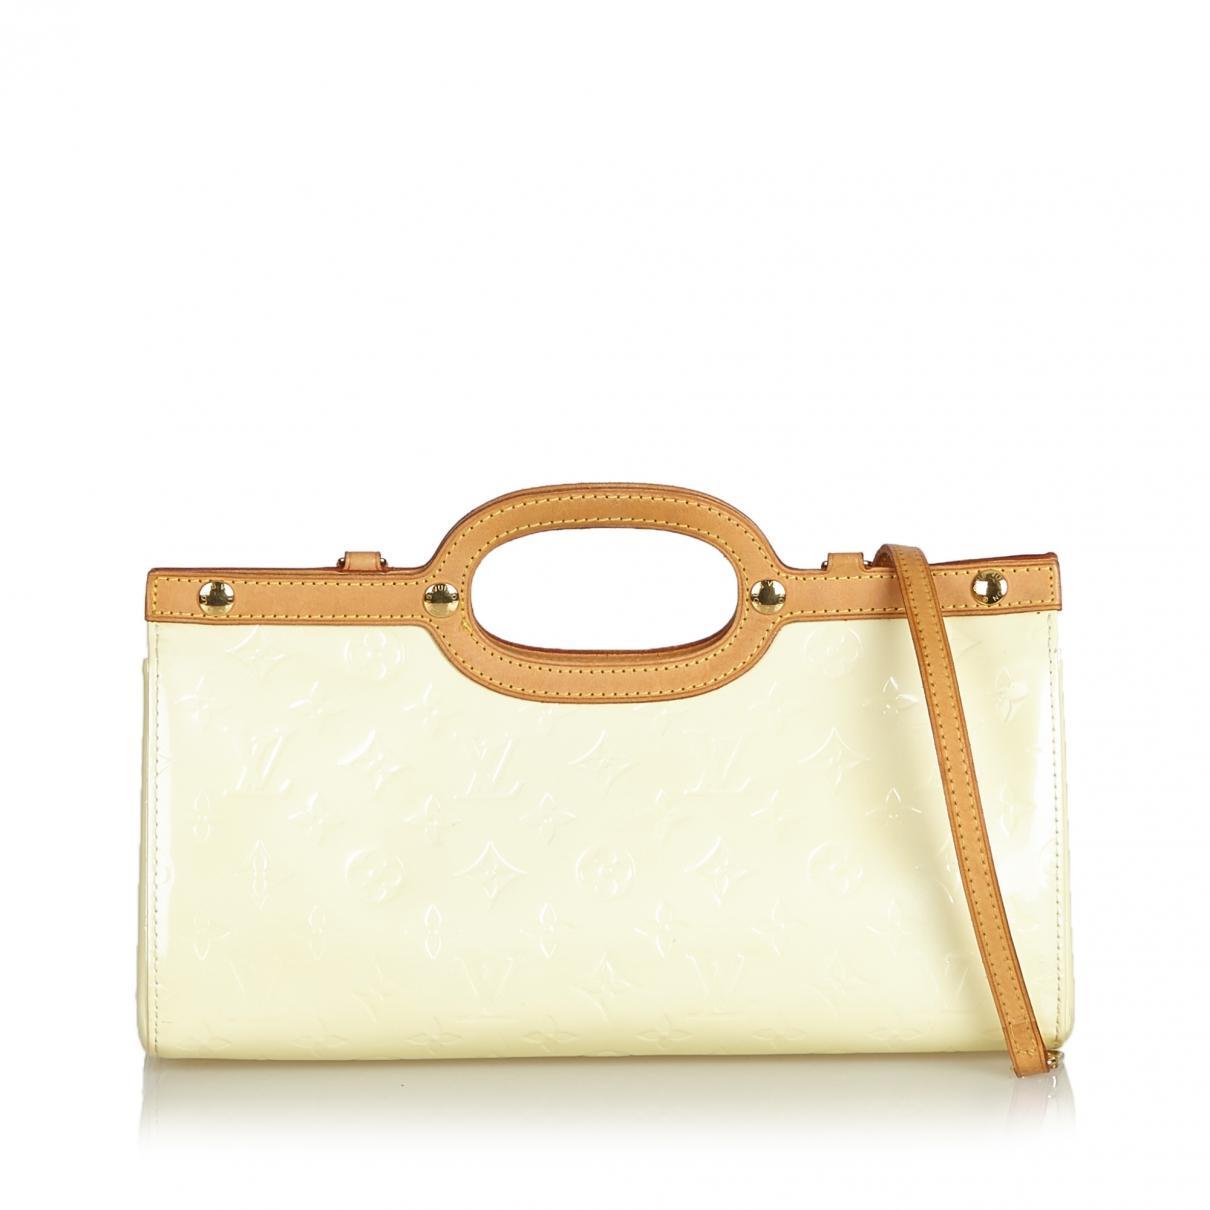 0956eaa83830 Lyst - Louis Vuitton Roxbury Patent Leather Satchel in White